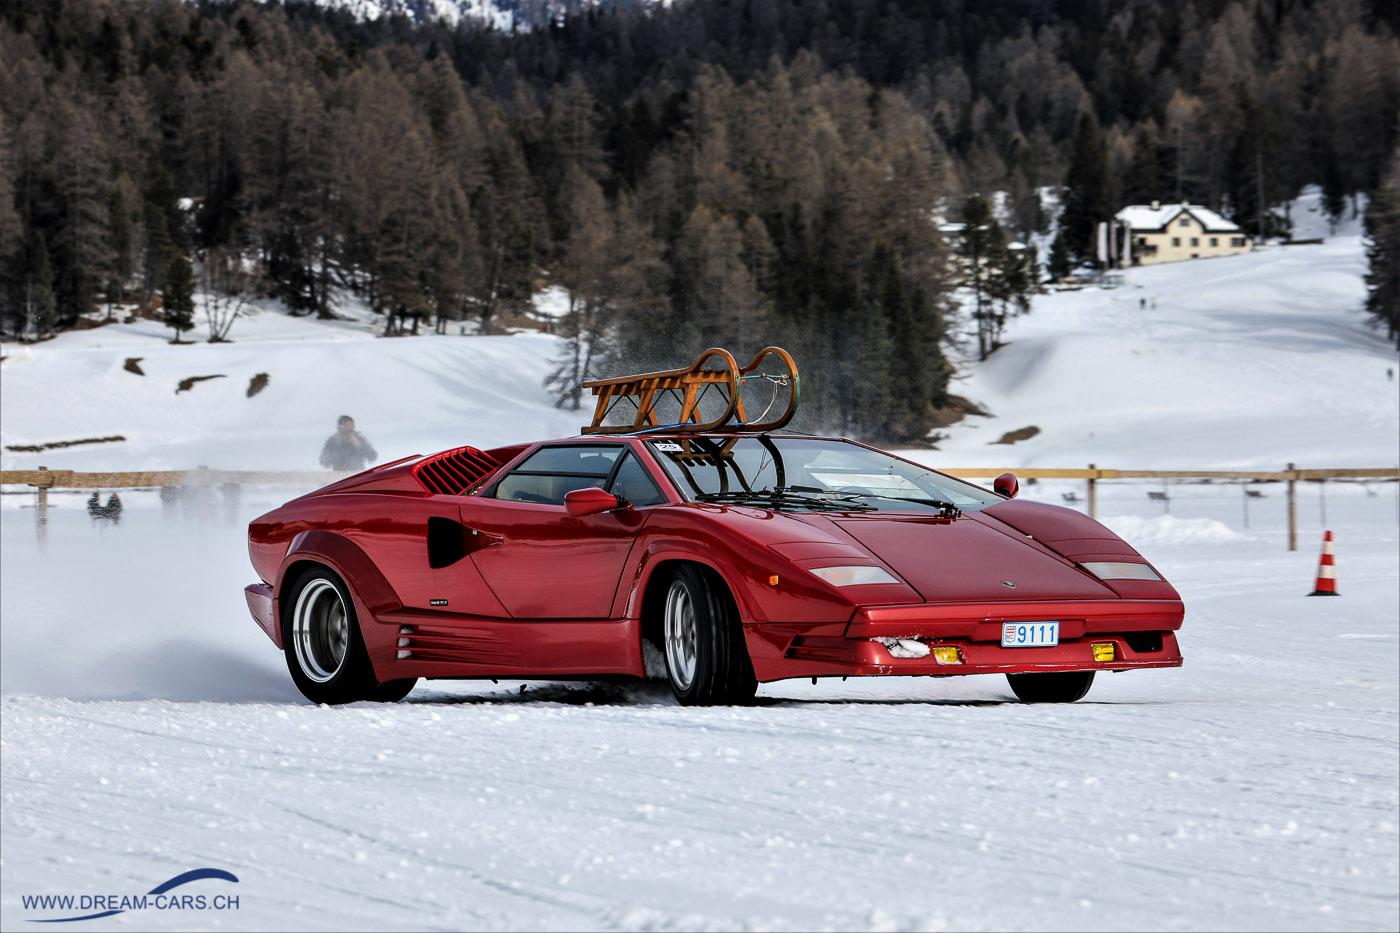 Lamborghini Countach mit Schlitten am The Ice in St. Moritz